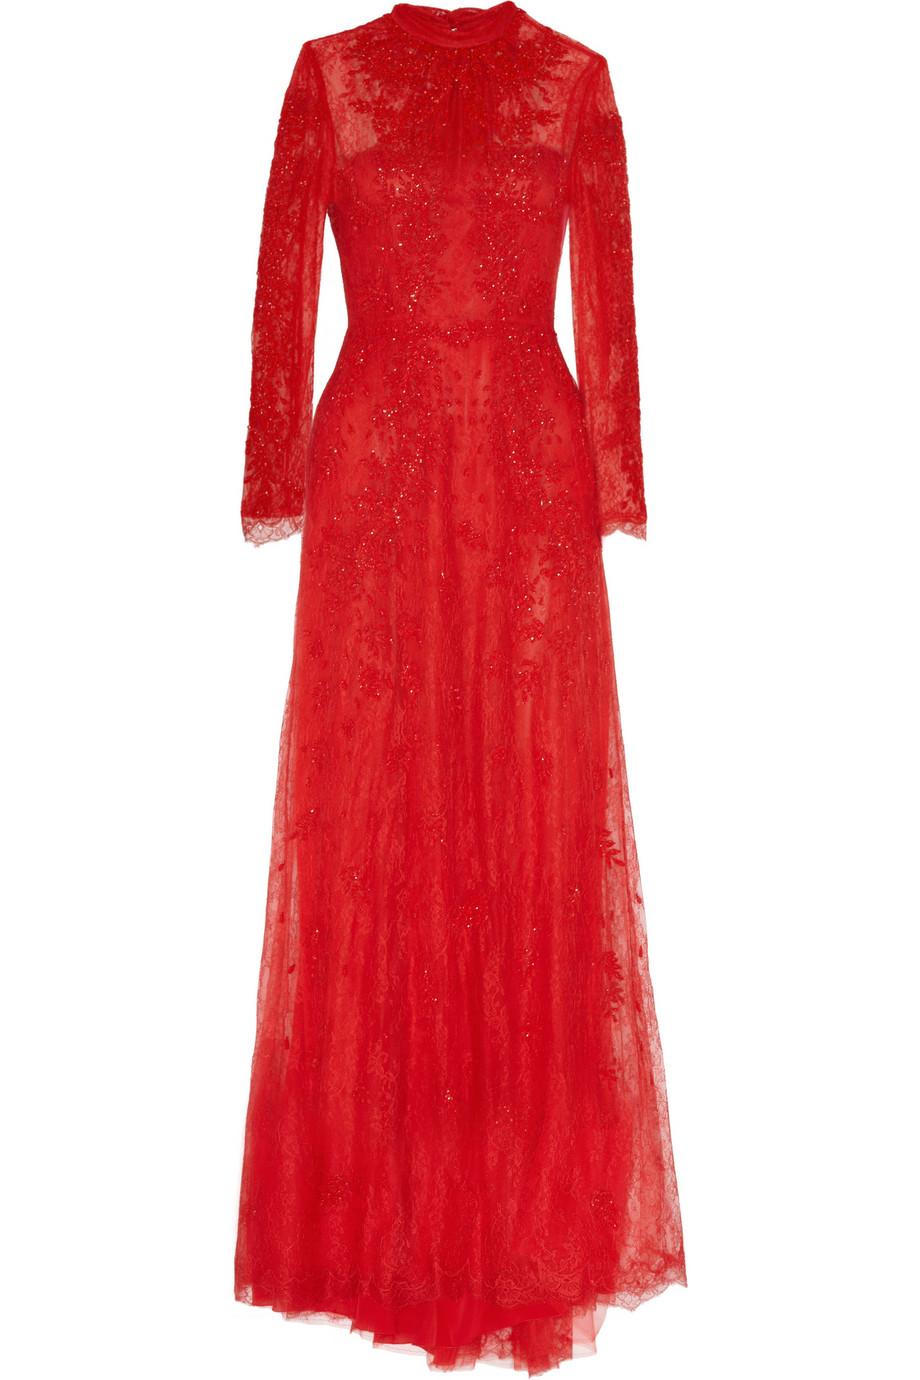 91a02a5d49a1b فستان دانتيل أحمر من فلانتينو valentino